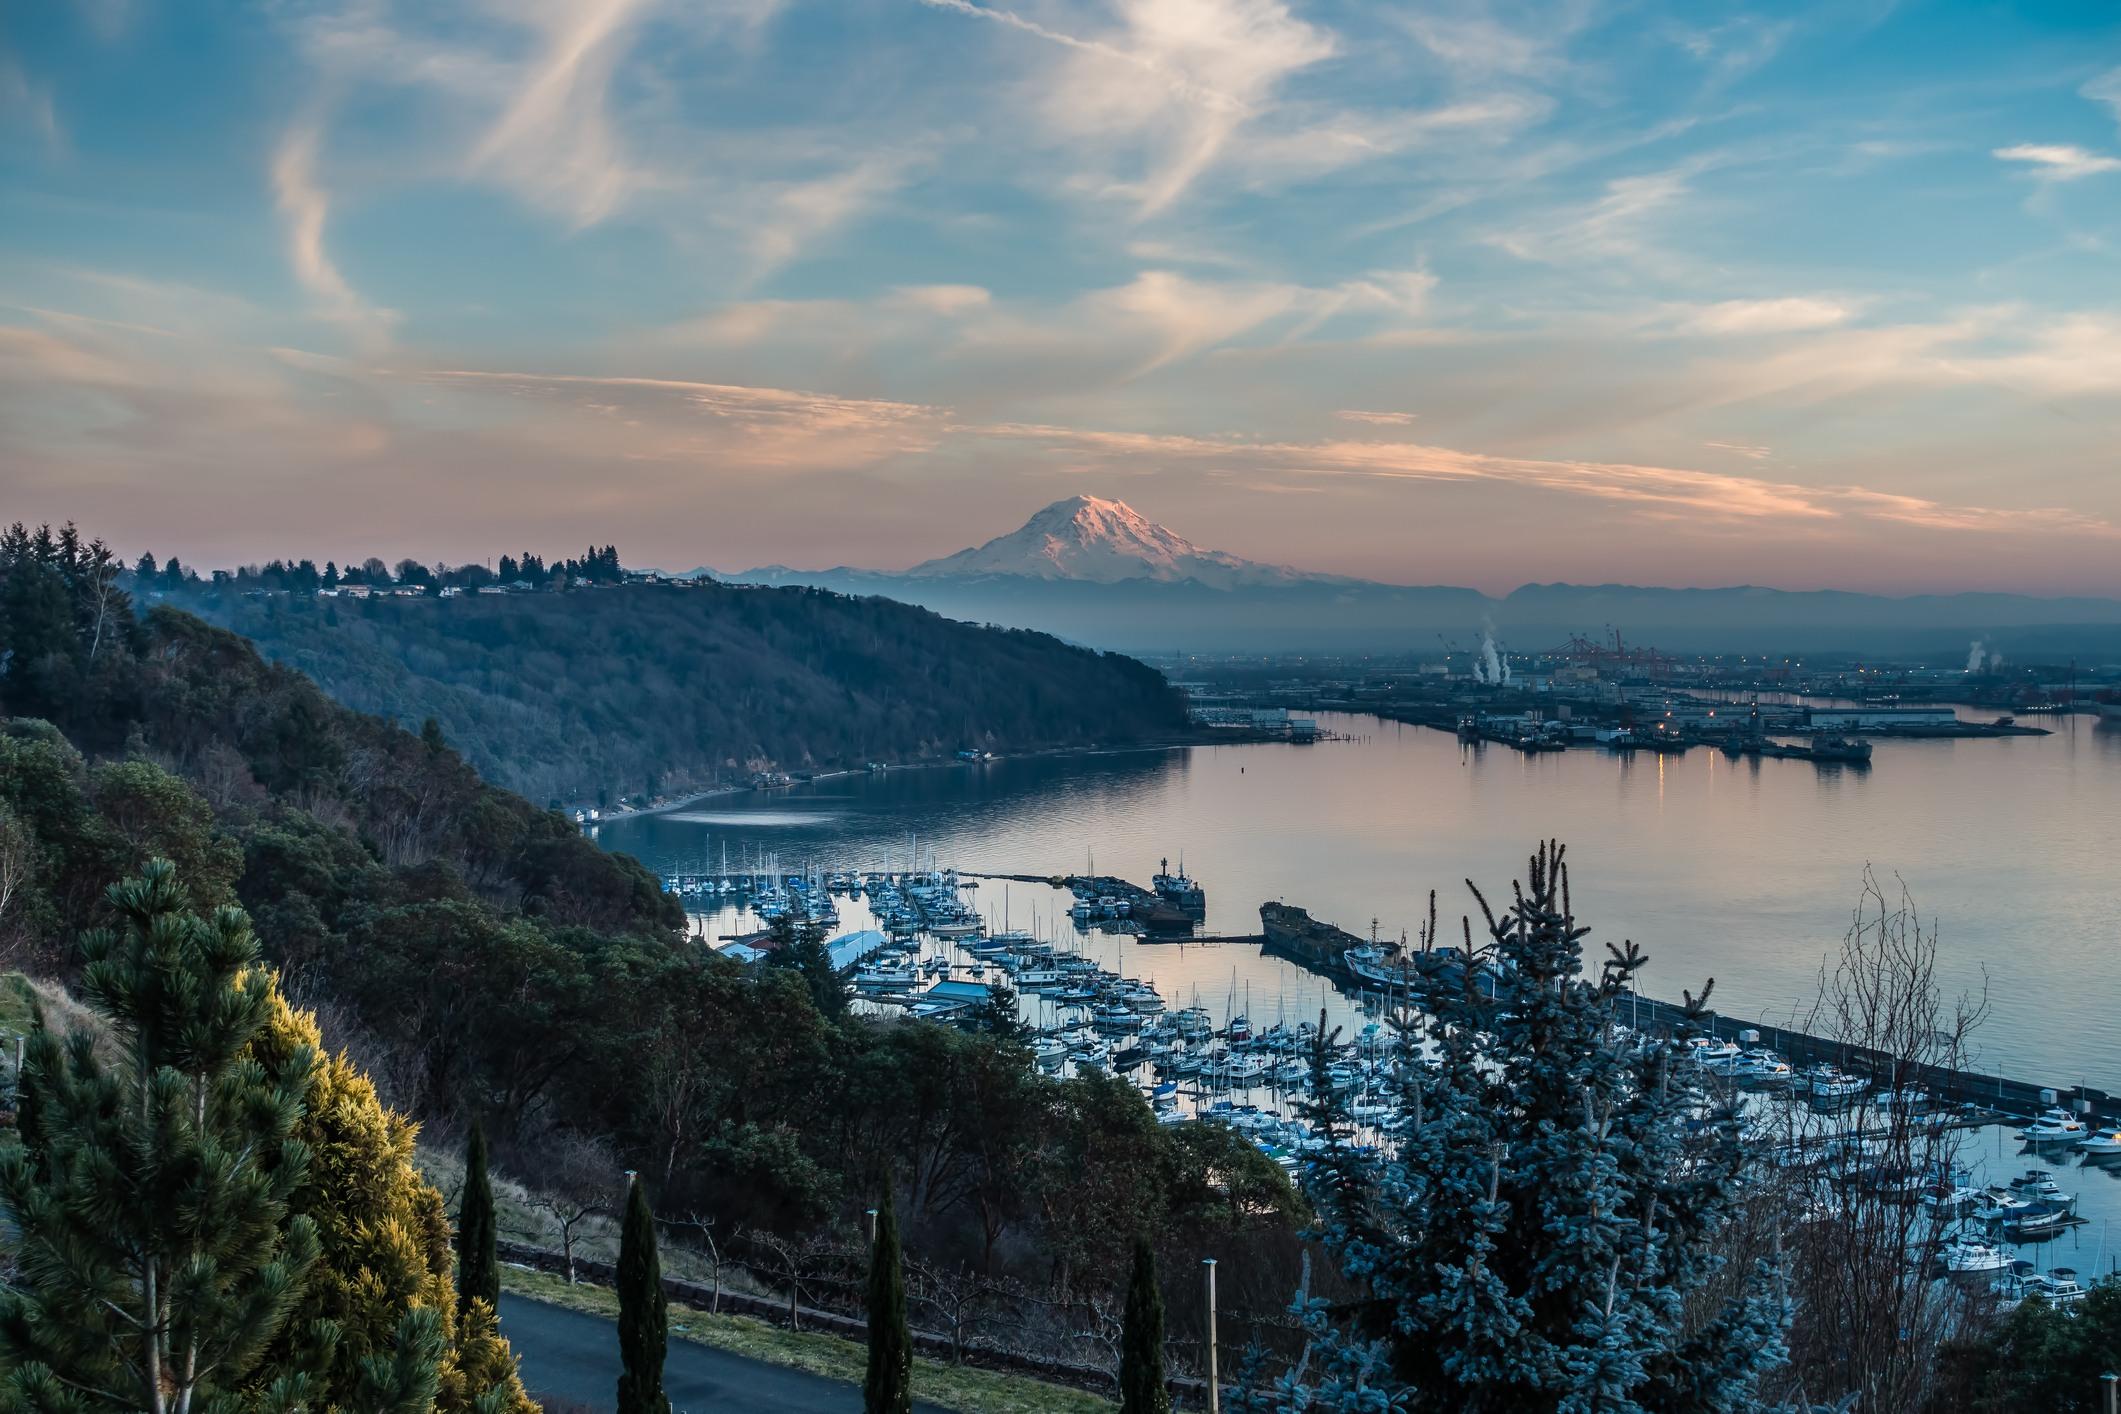 Tacoma Washington and Mount Rainier